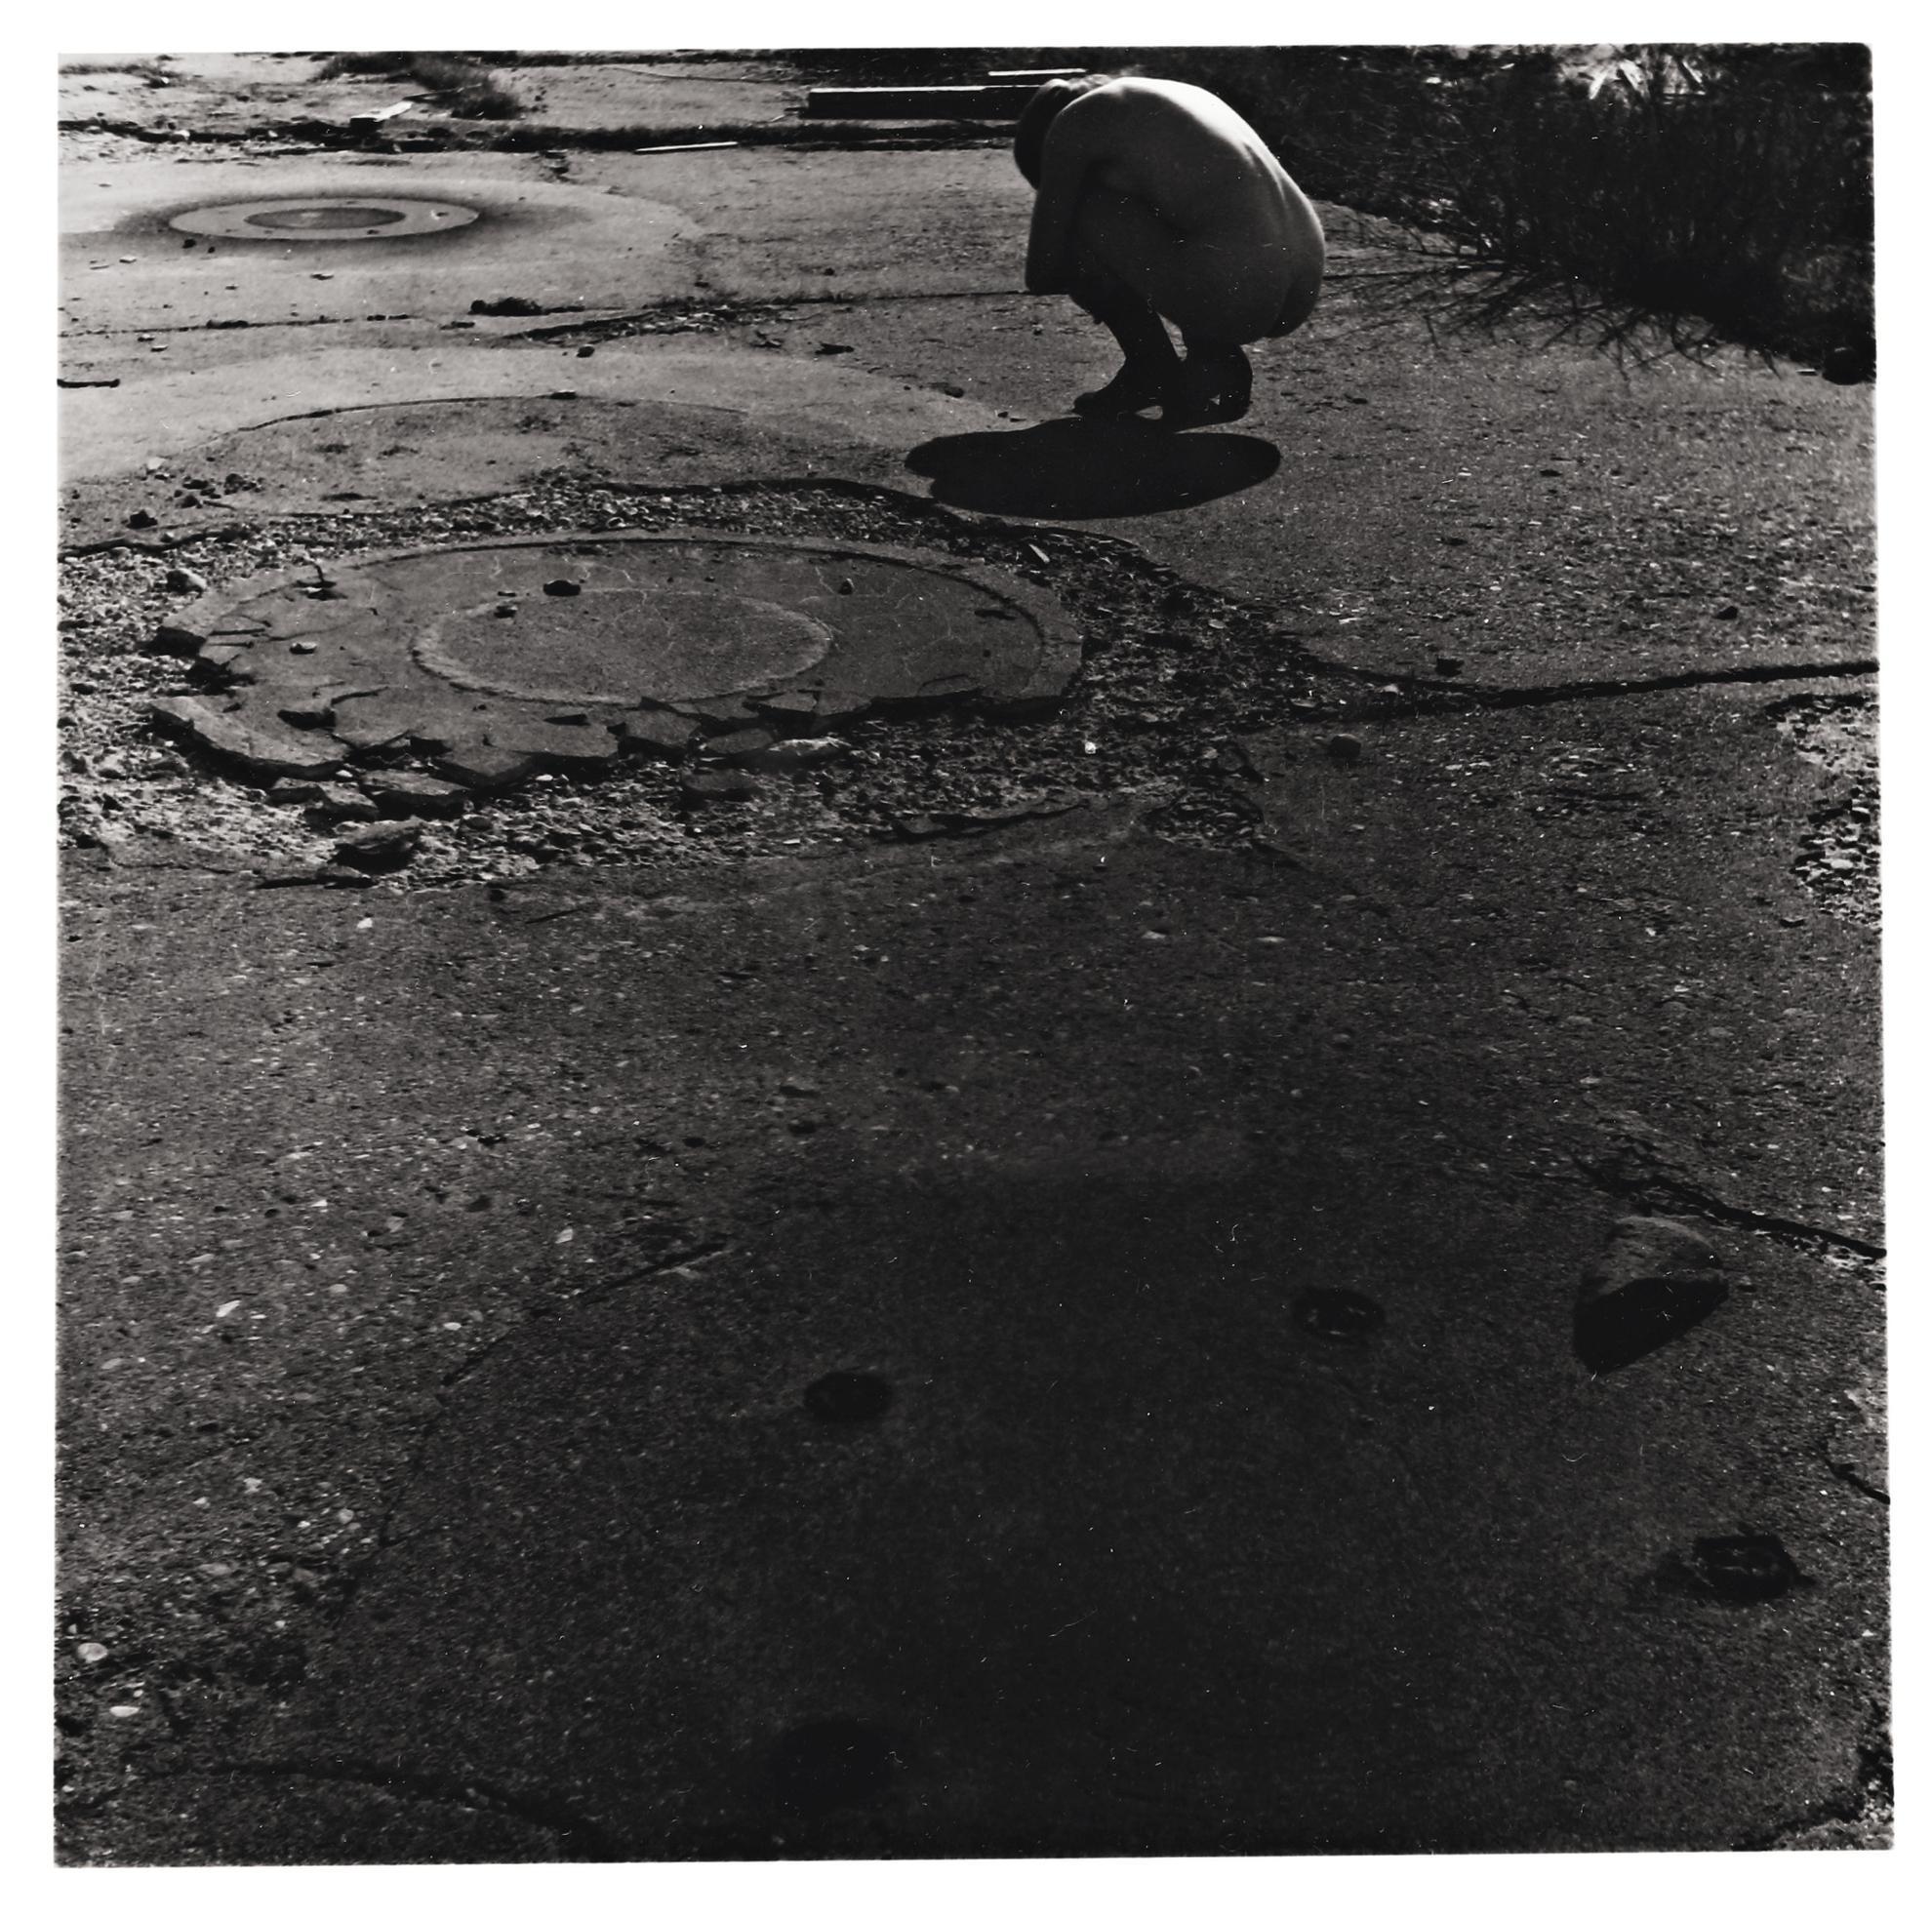 Francesca Woodman-Untitled, Providence, Rhode Island (Self-Portrait, Nude Crouching On Sidewalk)-1977